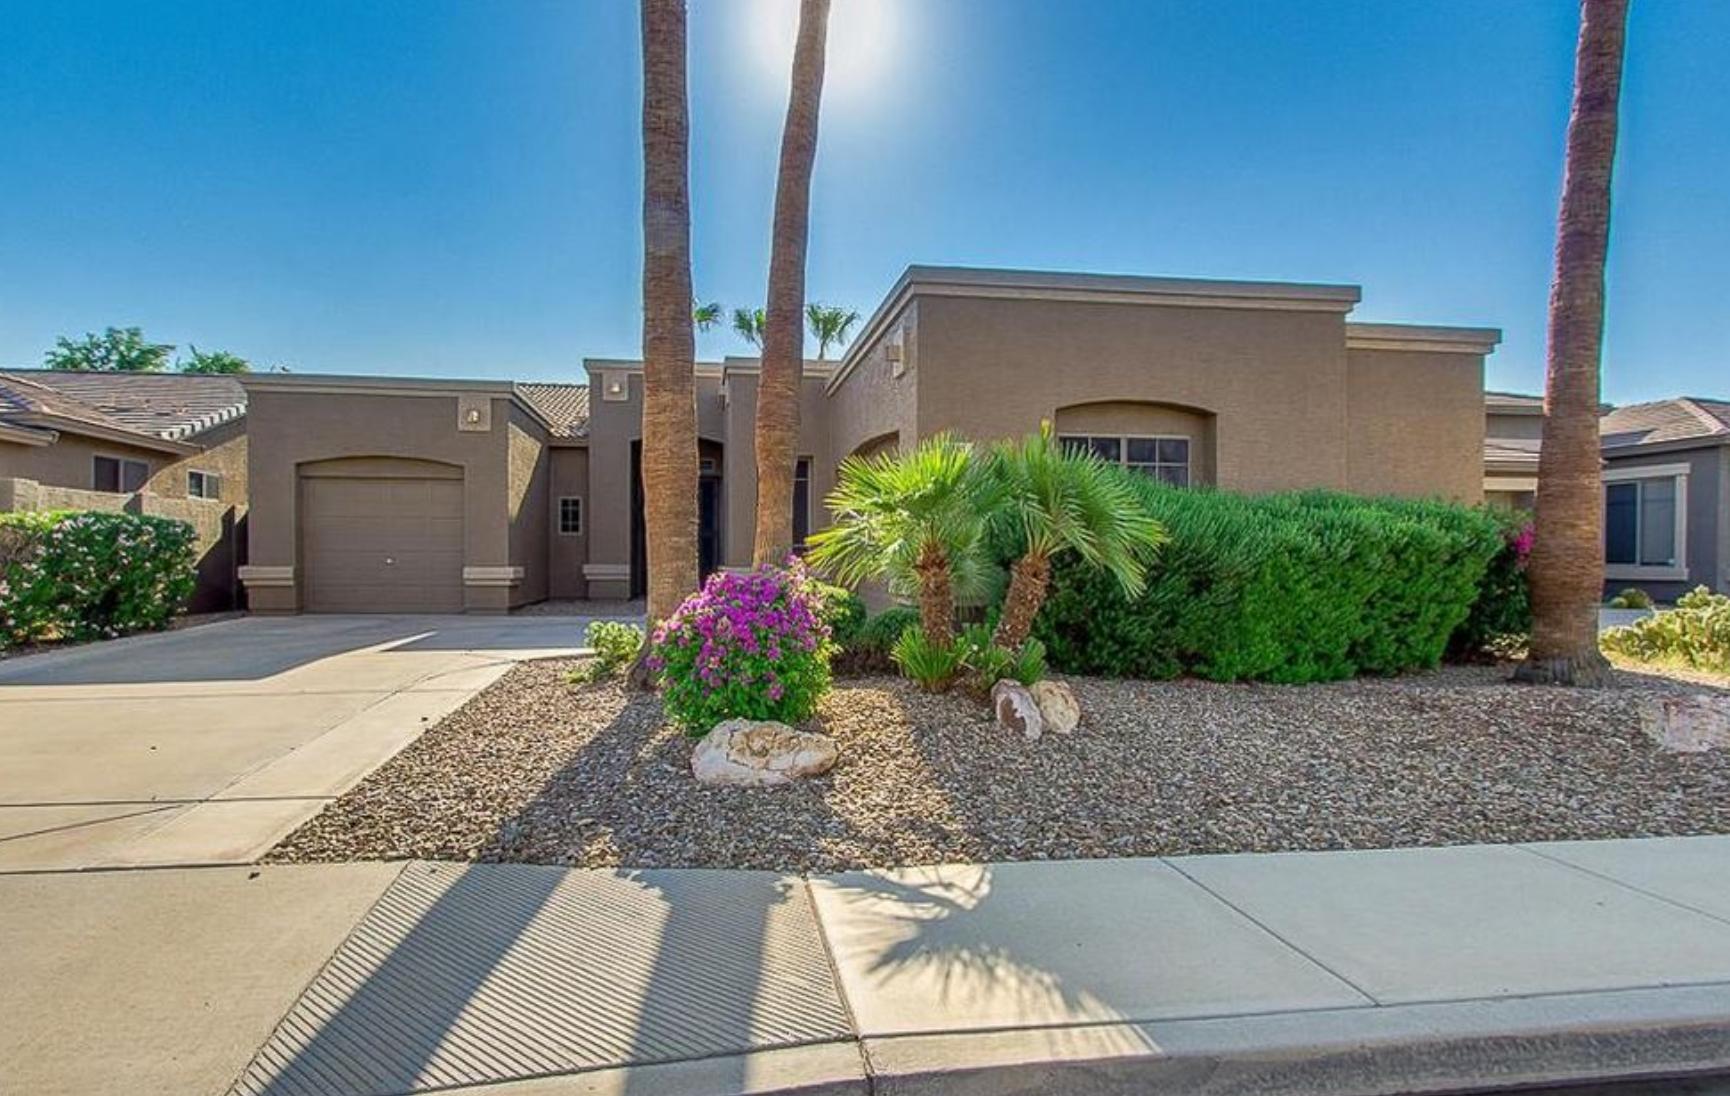 Chandler, Arizona (Phoenix-Mesa-Scottsdale, AZ); list price: $300,000; square footage: 1,954; beds/baths: 3/2